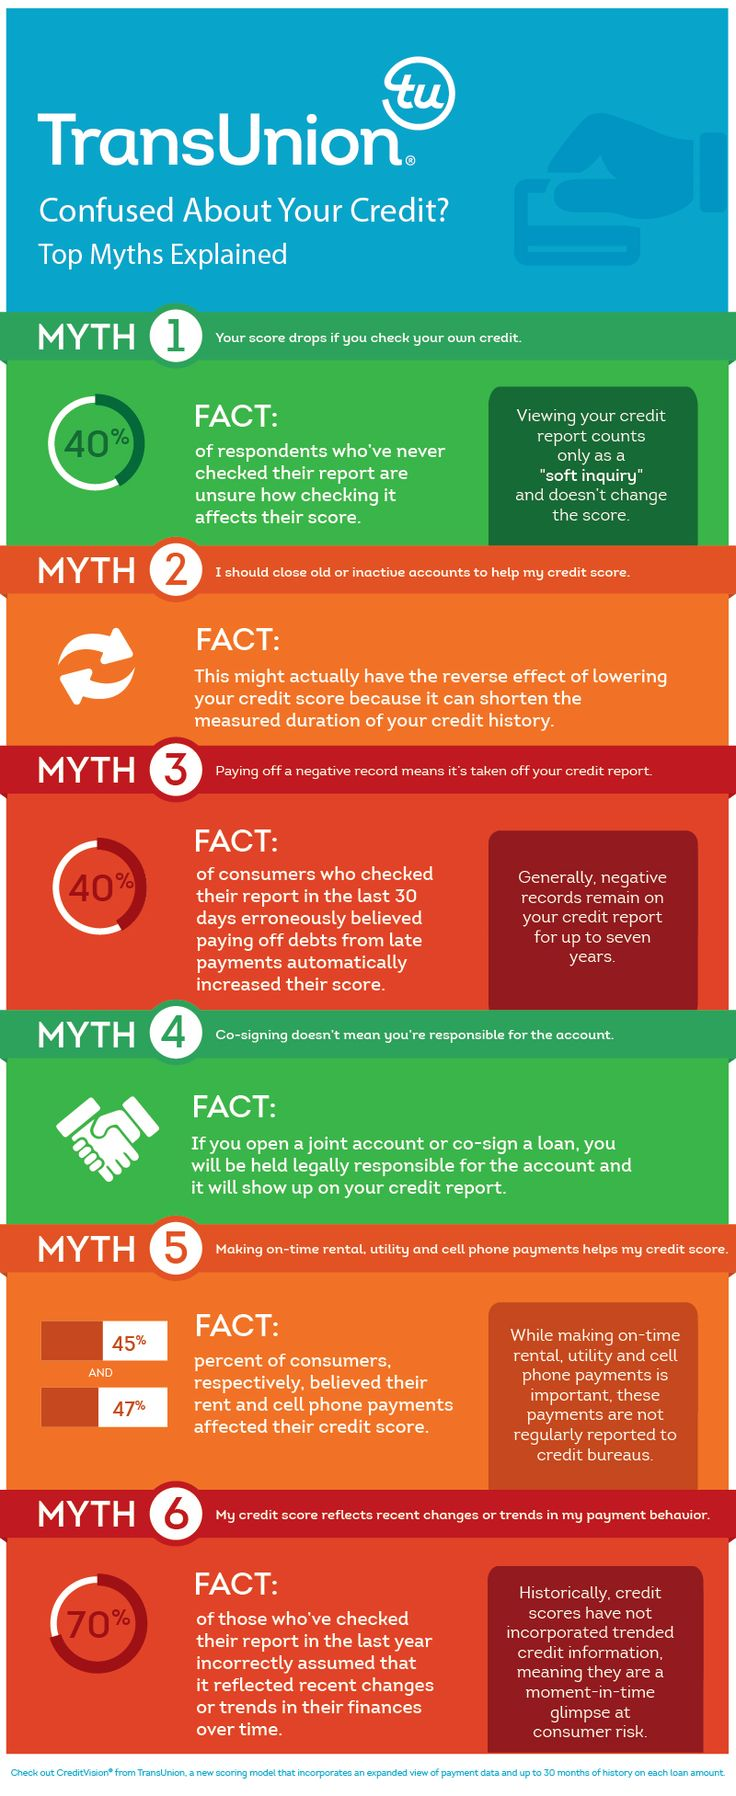 Trans Union 8 Top Credit Myths #Infographic #transunion